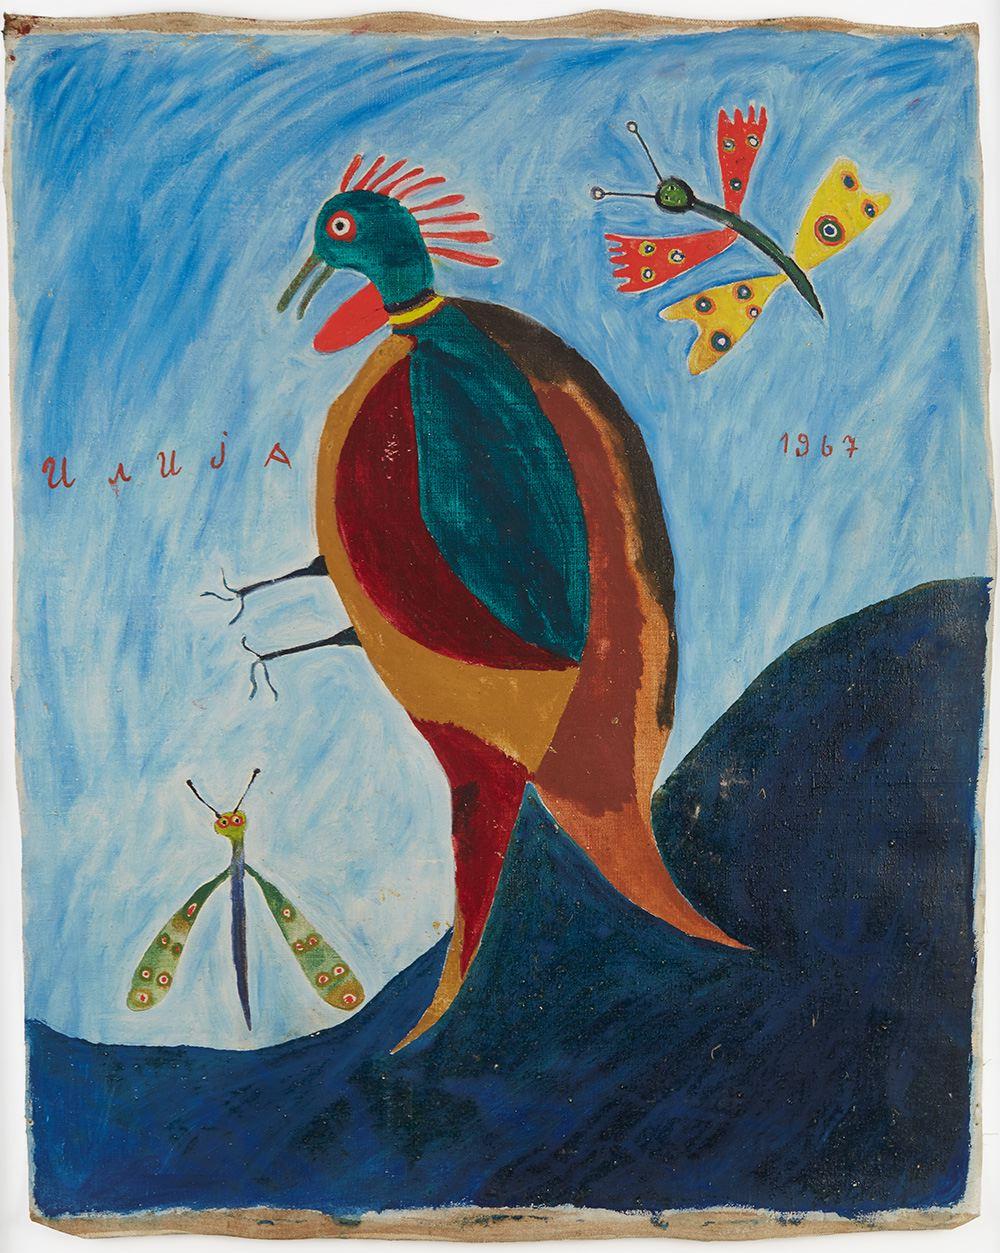 Ilija Bosilj Bašičević    Bird and Two Butterflies  , 1967 Oil on canvas 27 x 21.5 inches 68.6 x 54.6 cm IBo 15